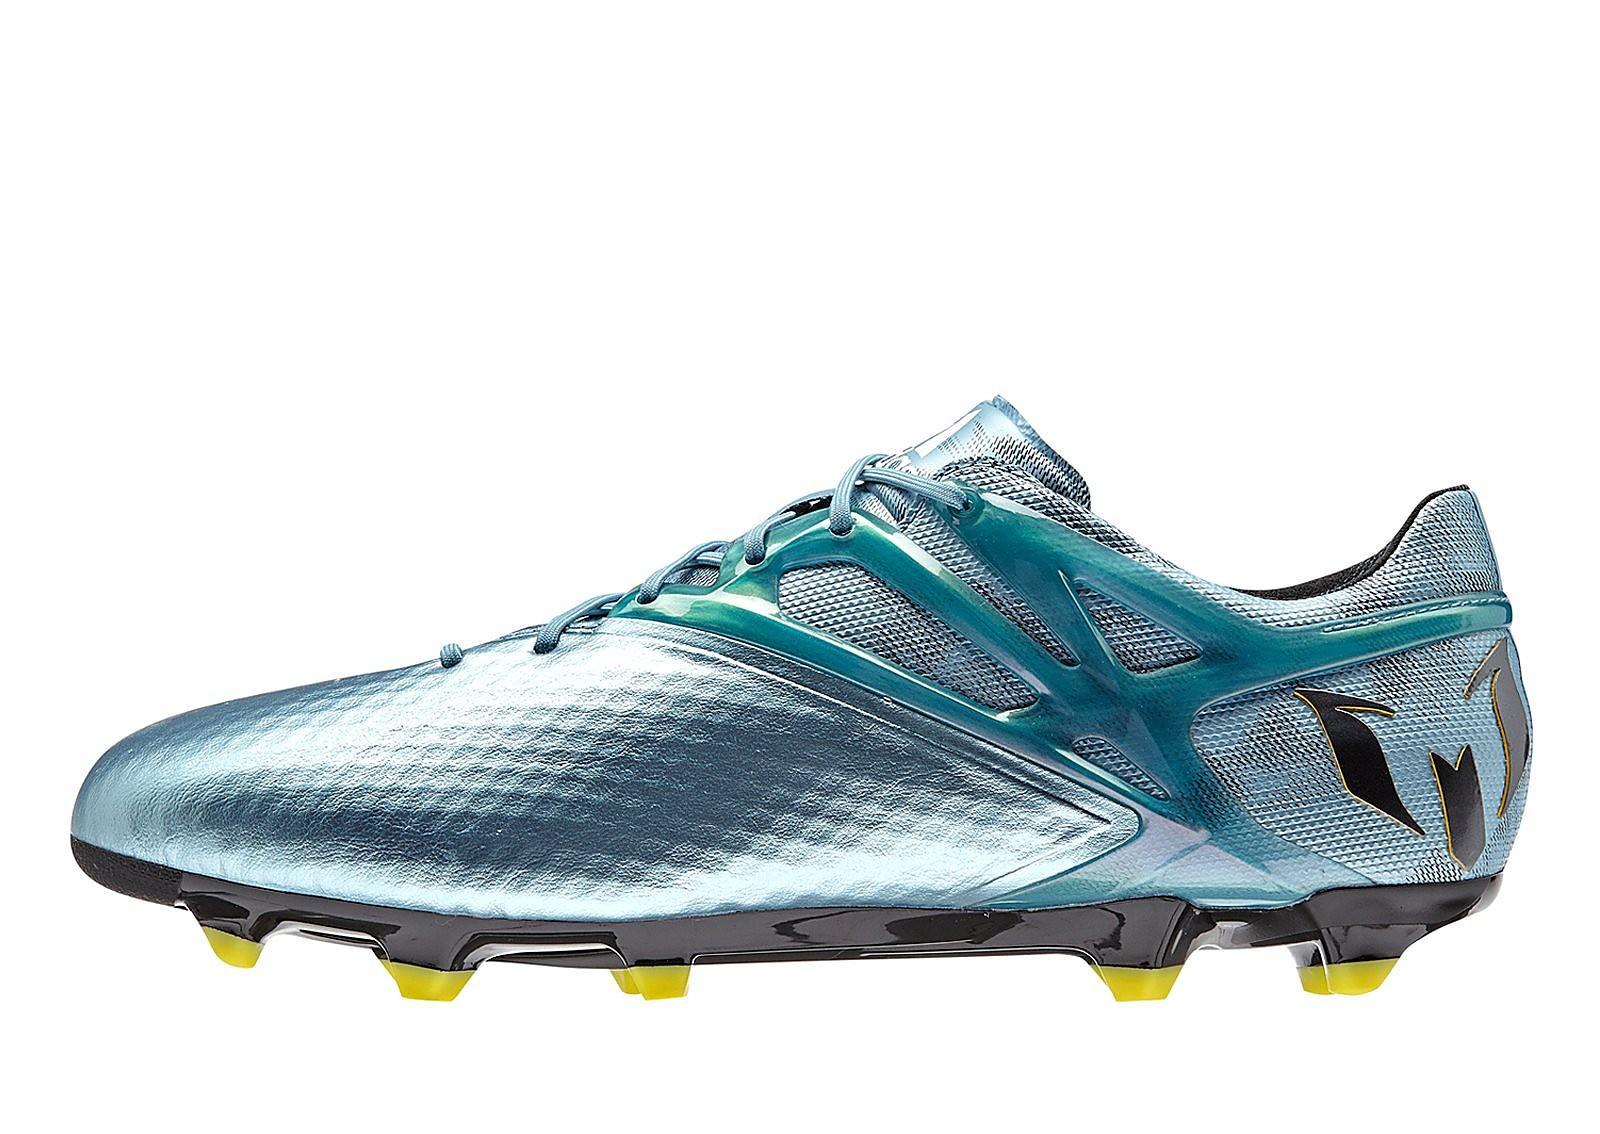 adidas messi pureagility football boots 16 1. Black Bedroom Furniture Sets. Home Design Ideas